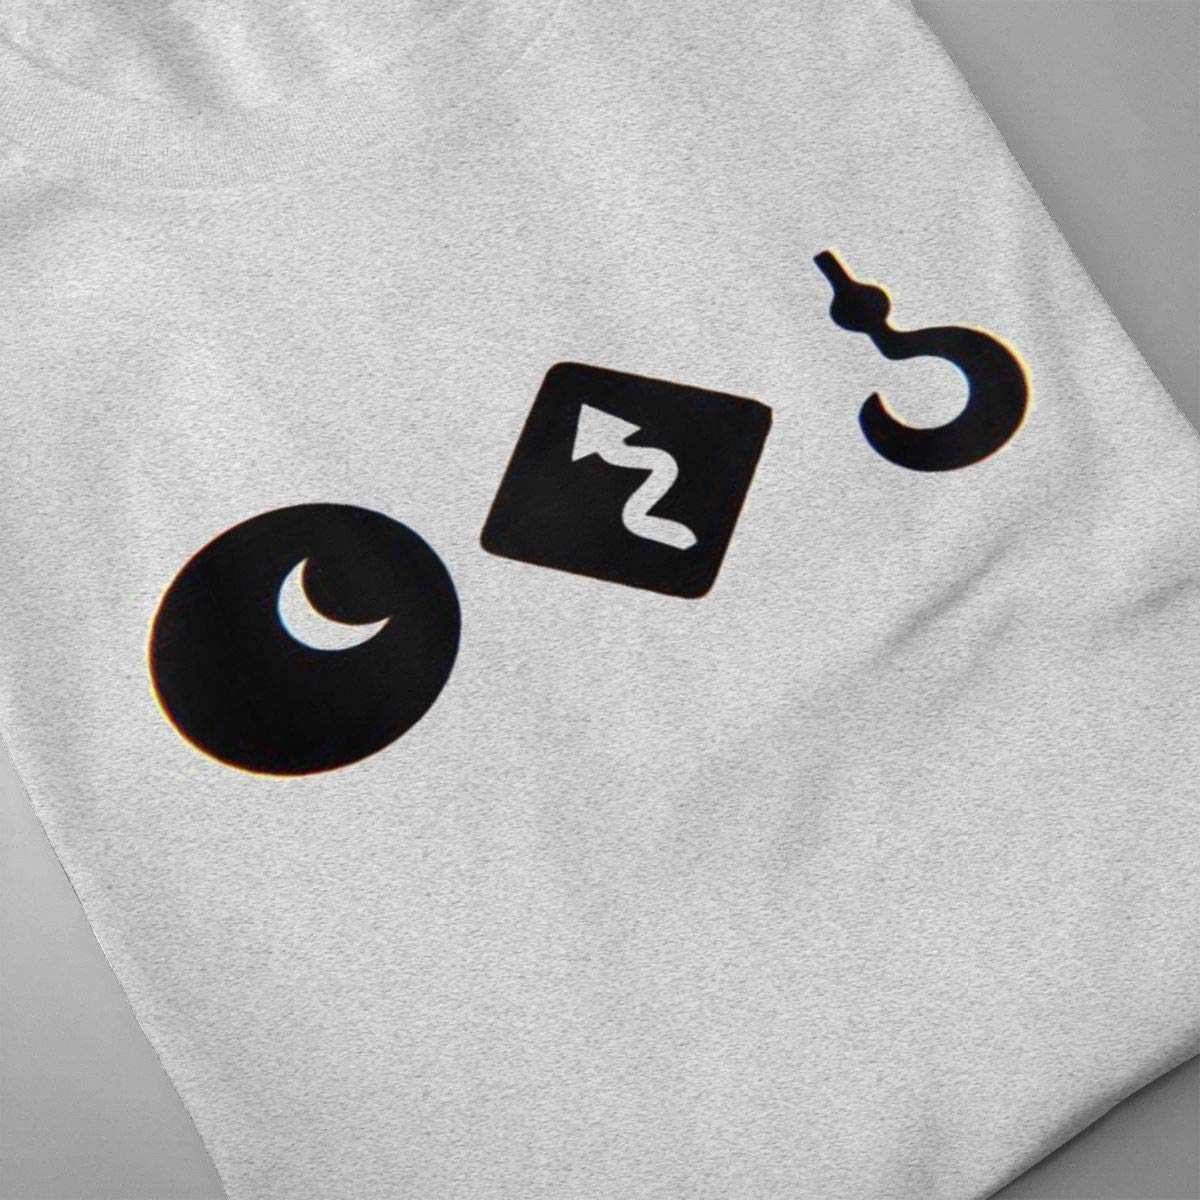 SHENGN Men Personalized Casual Fish Night Love Death Robots Logo Short Sleeve Humor T-Shirt Gray